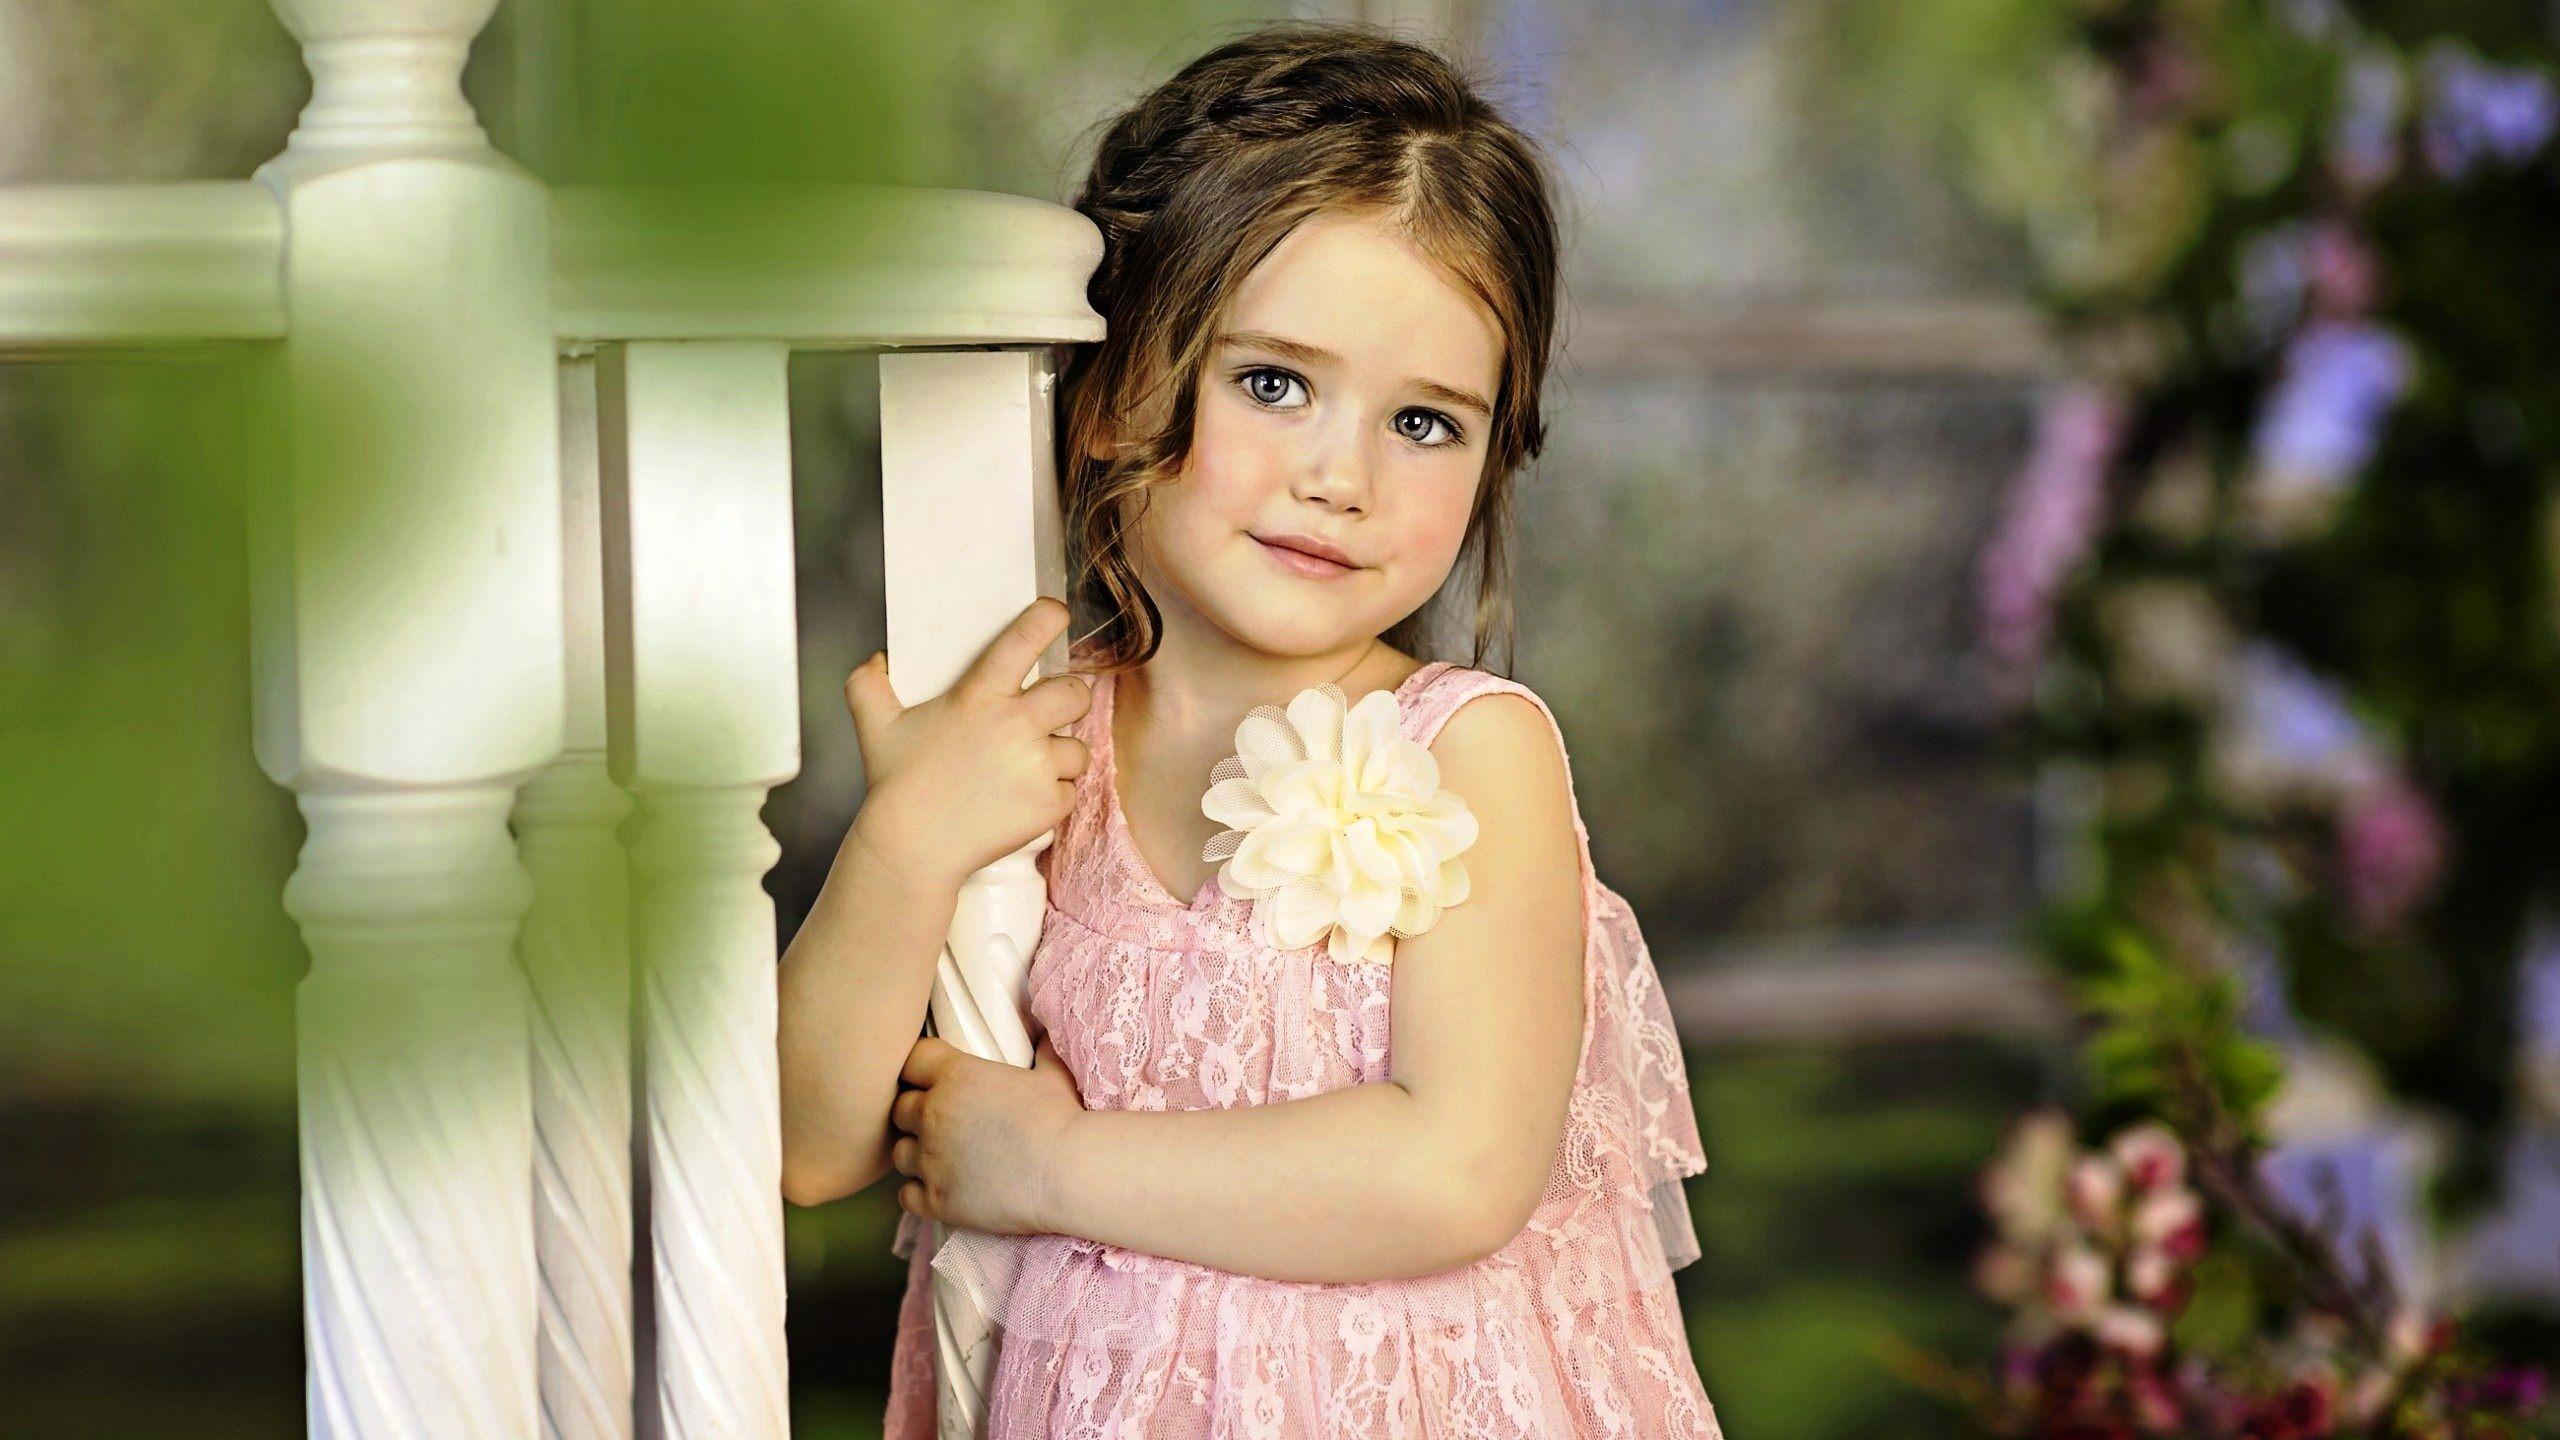 21+ Cute Baby Wallpapers, Backgrounds, Kids, Children ...